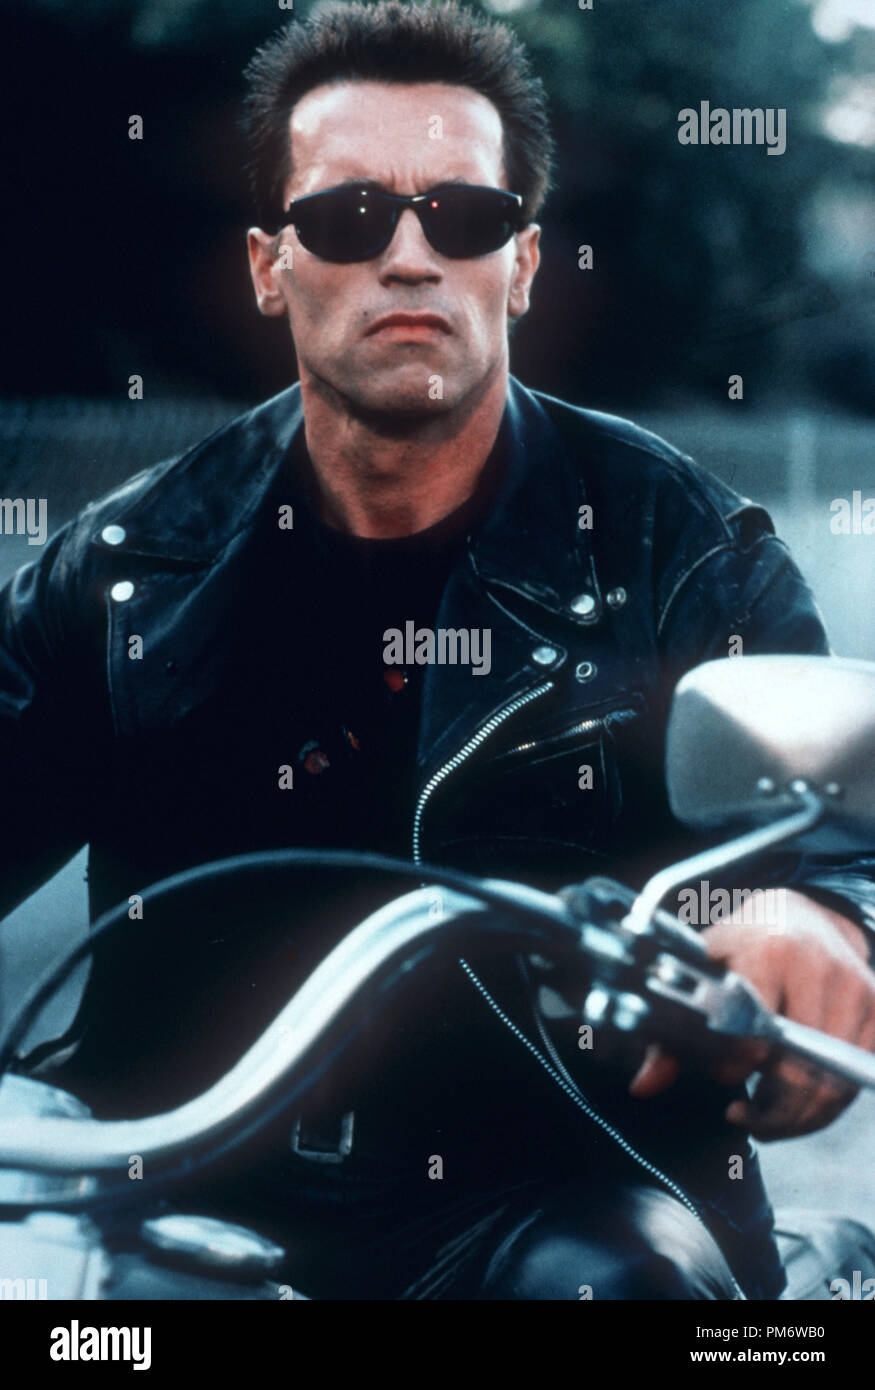 Film Still from 'Terminator 2: Judgment Day' Arnold Schwarzenegger © 1991 Carolco - Stock Image